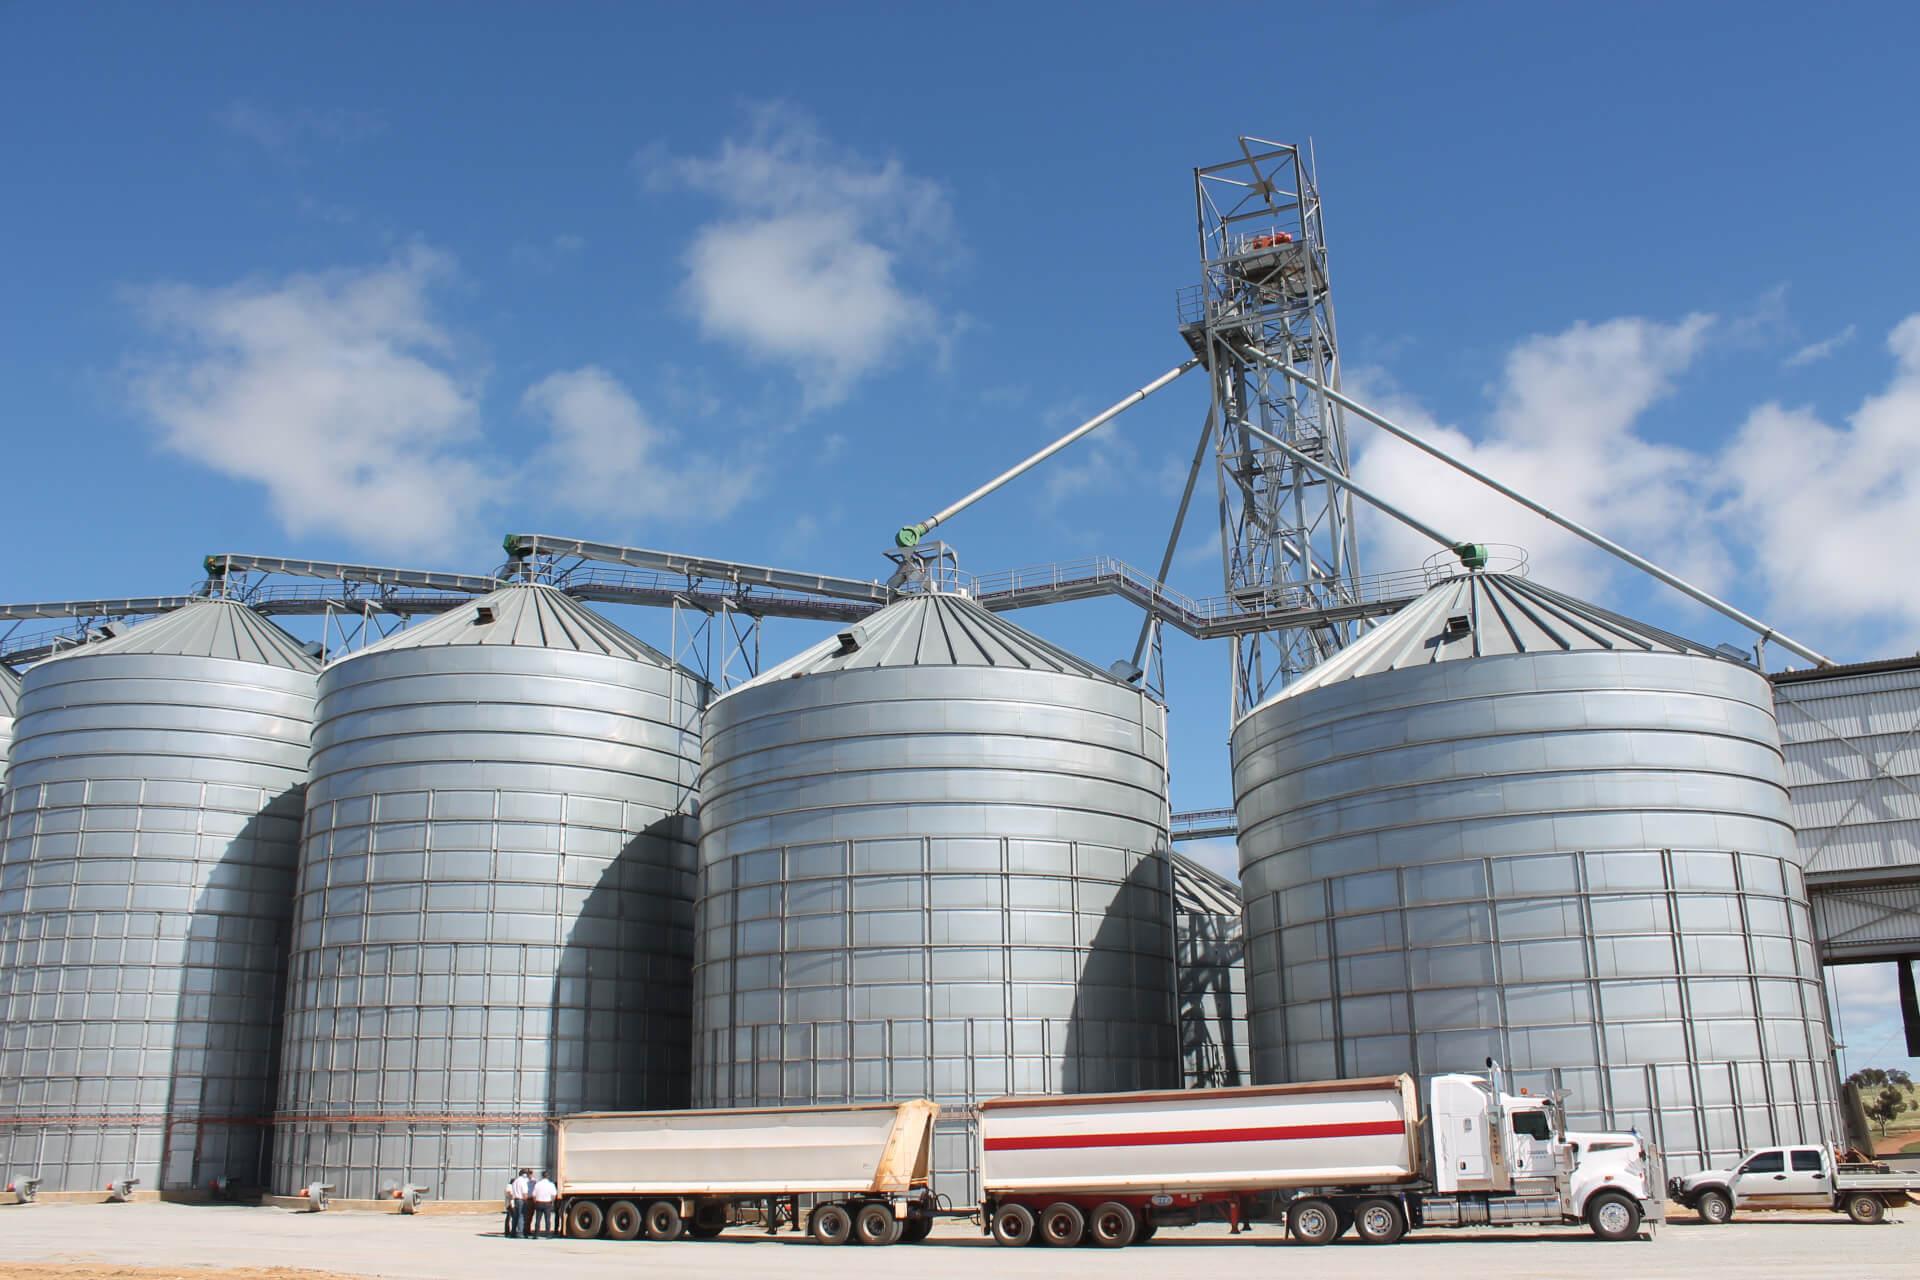 Сельхозпроизводители Казахстана настаивают на отмене платы за хранение зерна